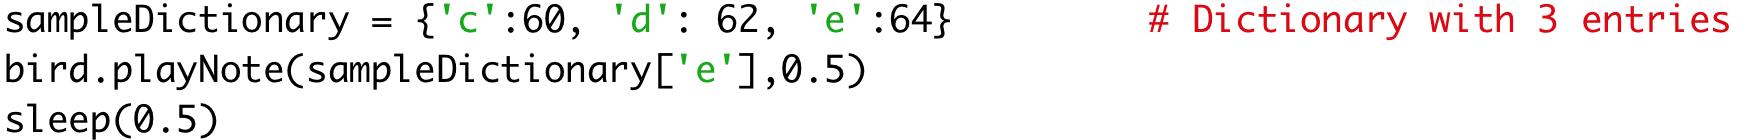 sampleDictionary = {'c':60, 'd': 62, 'e':64} # Dictionary with two entries  bird.playNote(sampleDictionary['e'],0.5)  sleep(0.5)